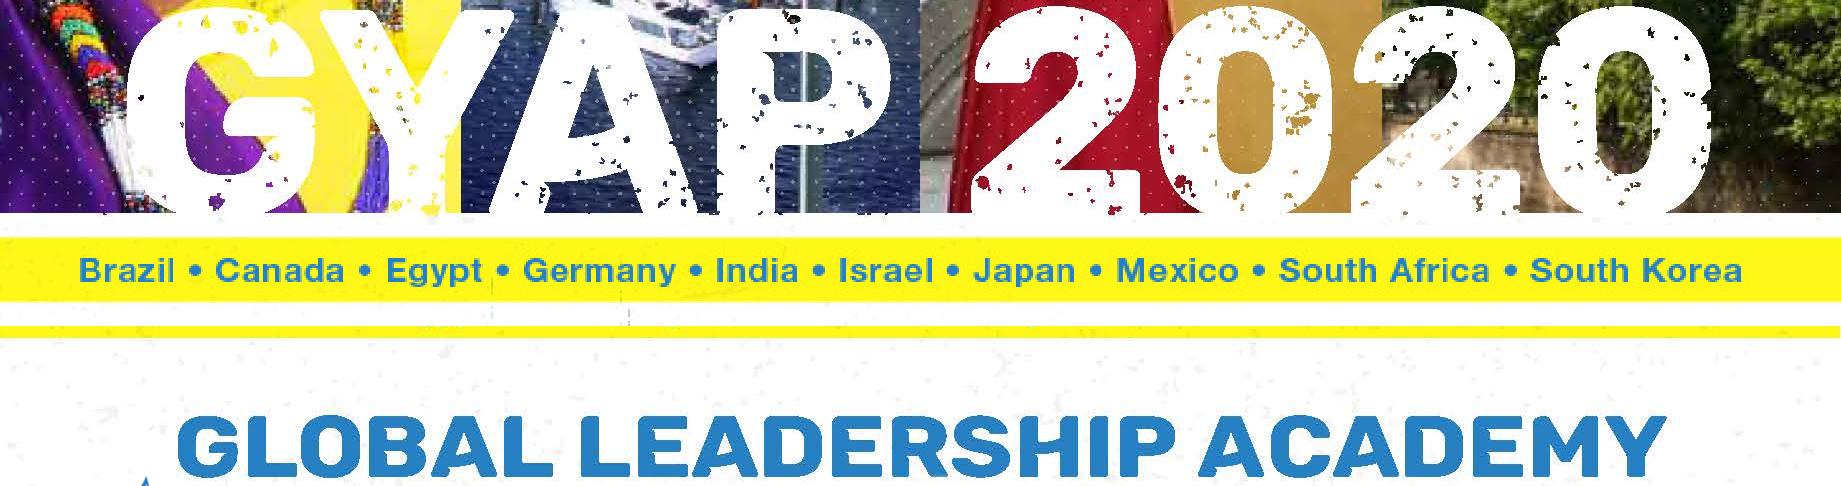 Global Youth Ambassadors Program Global Leadership Academy About Gla 2021